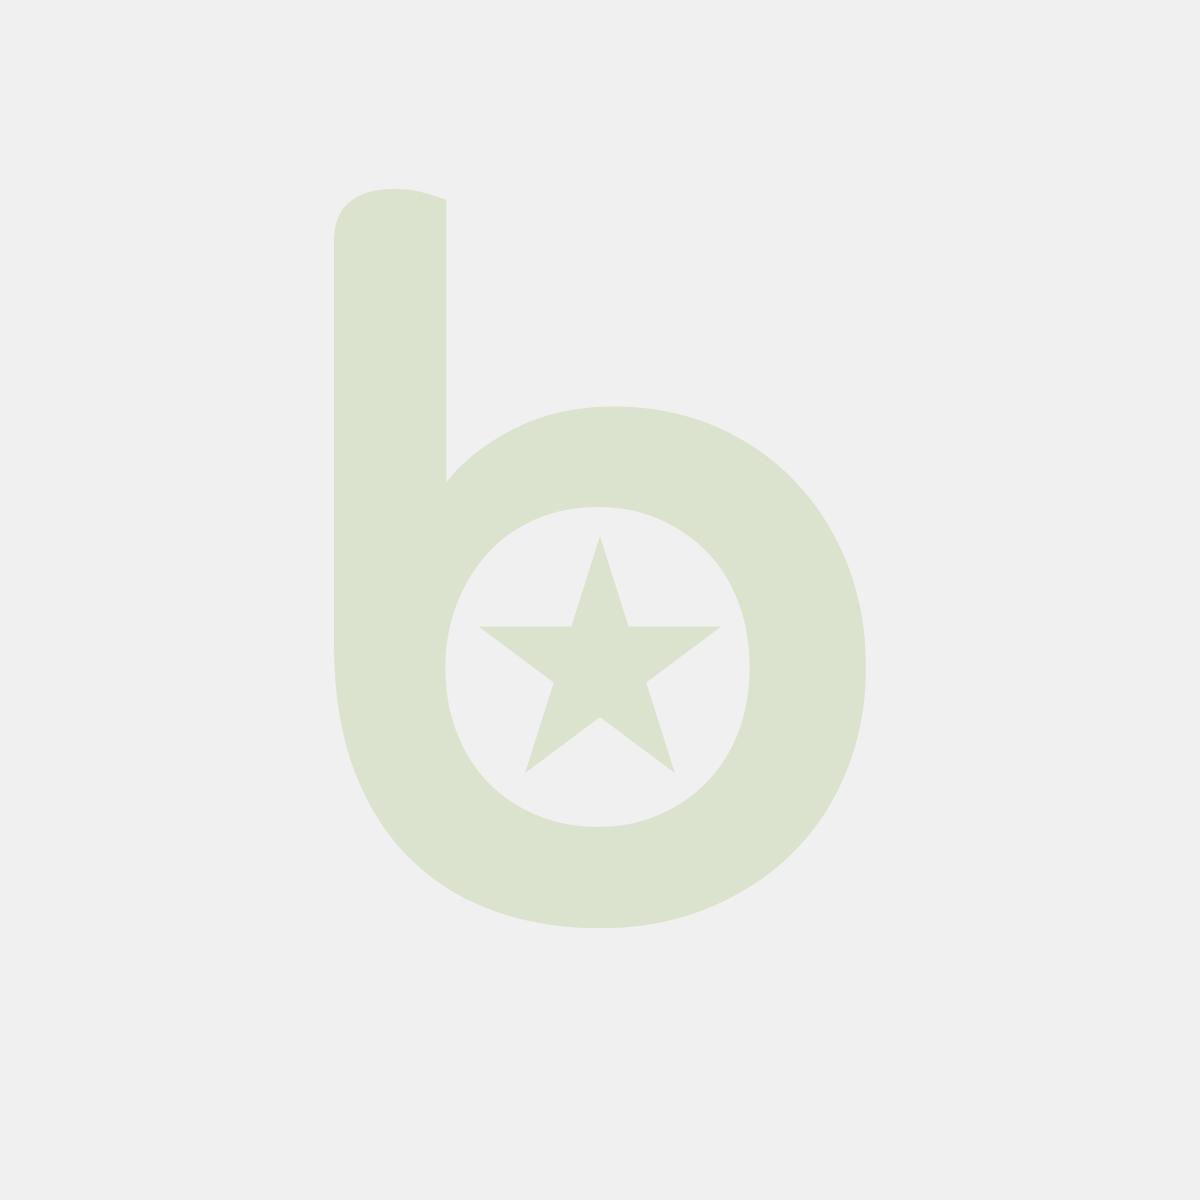 Flipchart na trójnogu NOBO Basic (Barrakuda/Nautile), 75x100cm, tablica niemagnetyczna